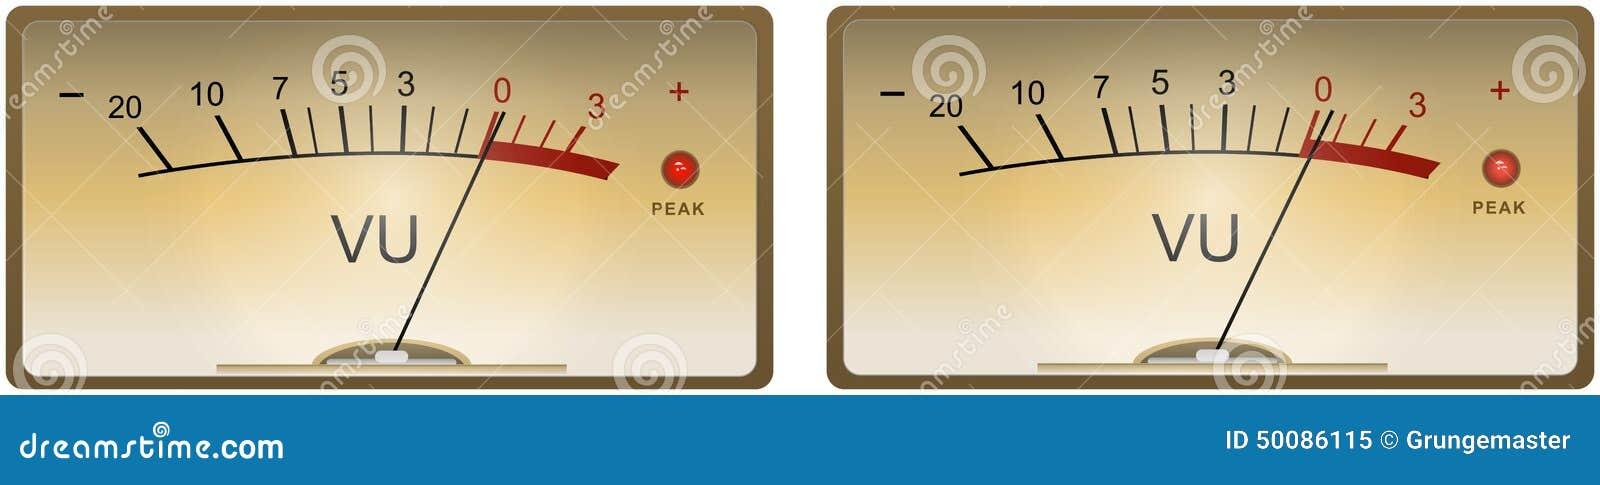 Analog Vu Meter : Analog vu meters stock vector image